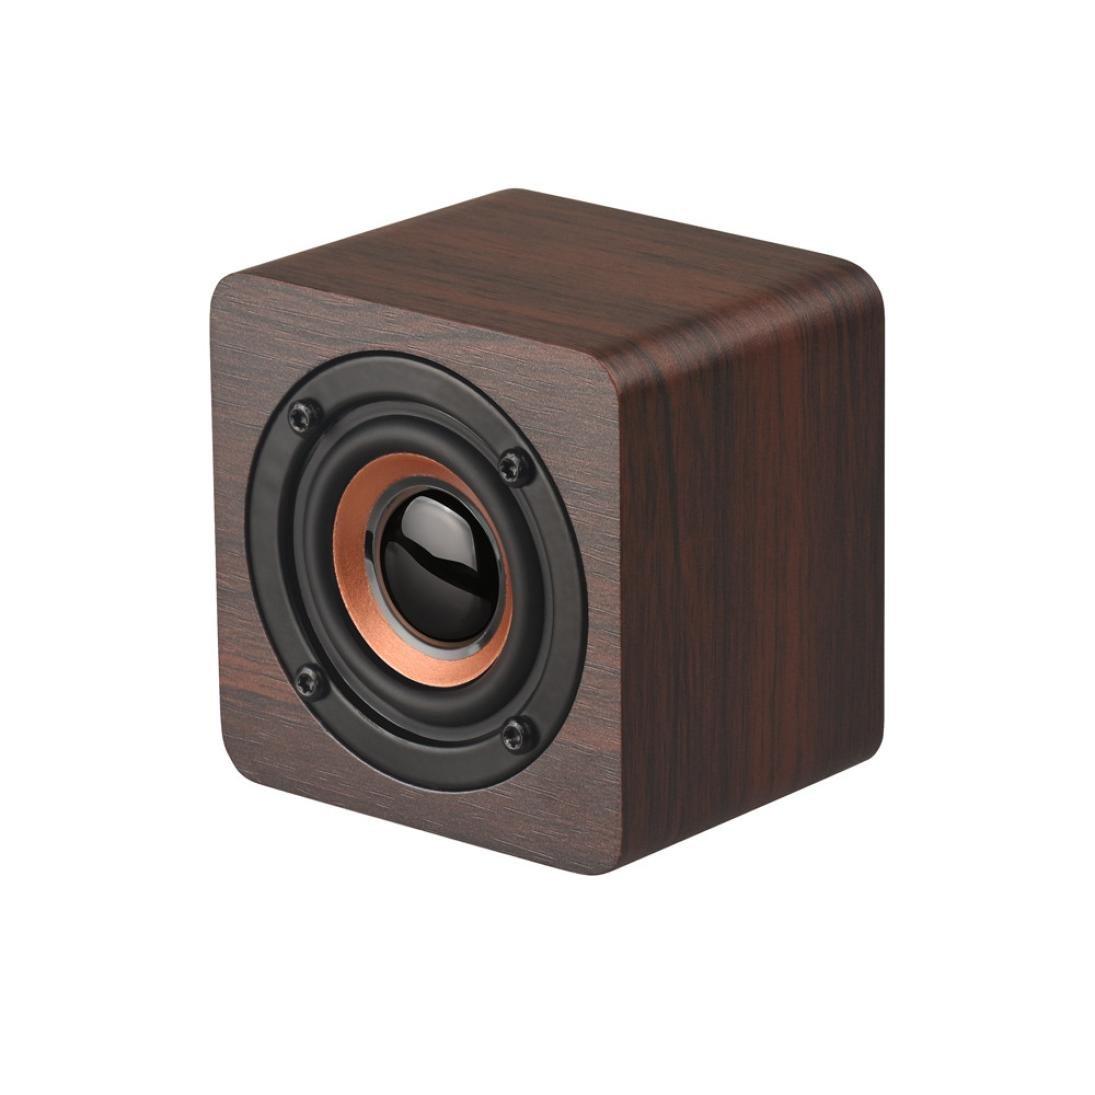 Wooden Wood Subwoofer Wireless BT4.2 Speaker HIFI Stereo Bass Speaker, Portable Super Bass Wireless Bluetooth Speaker Outdoor & Indoor (C)